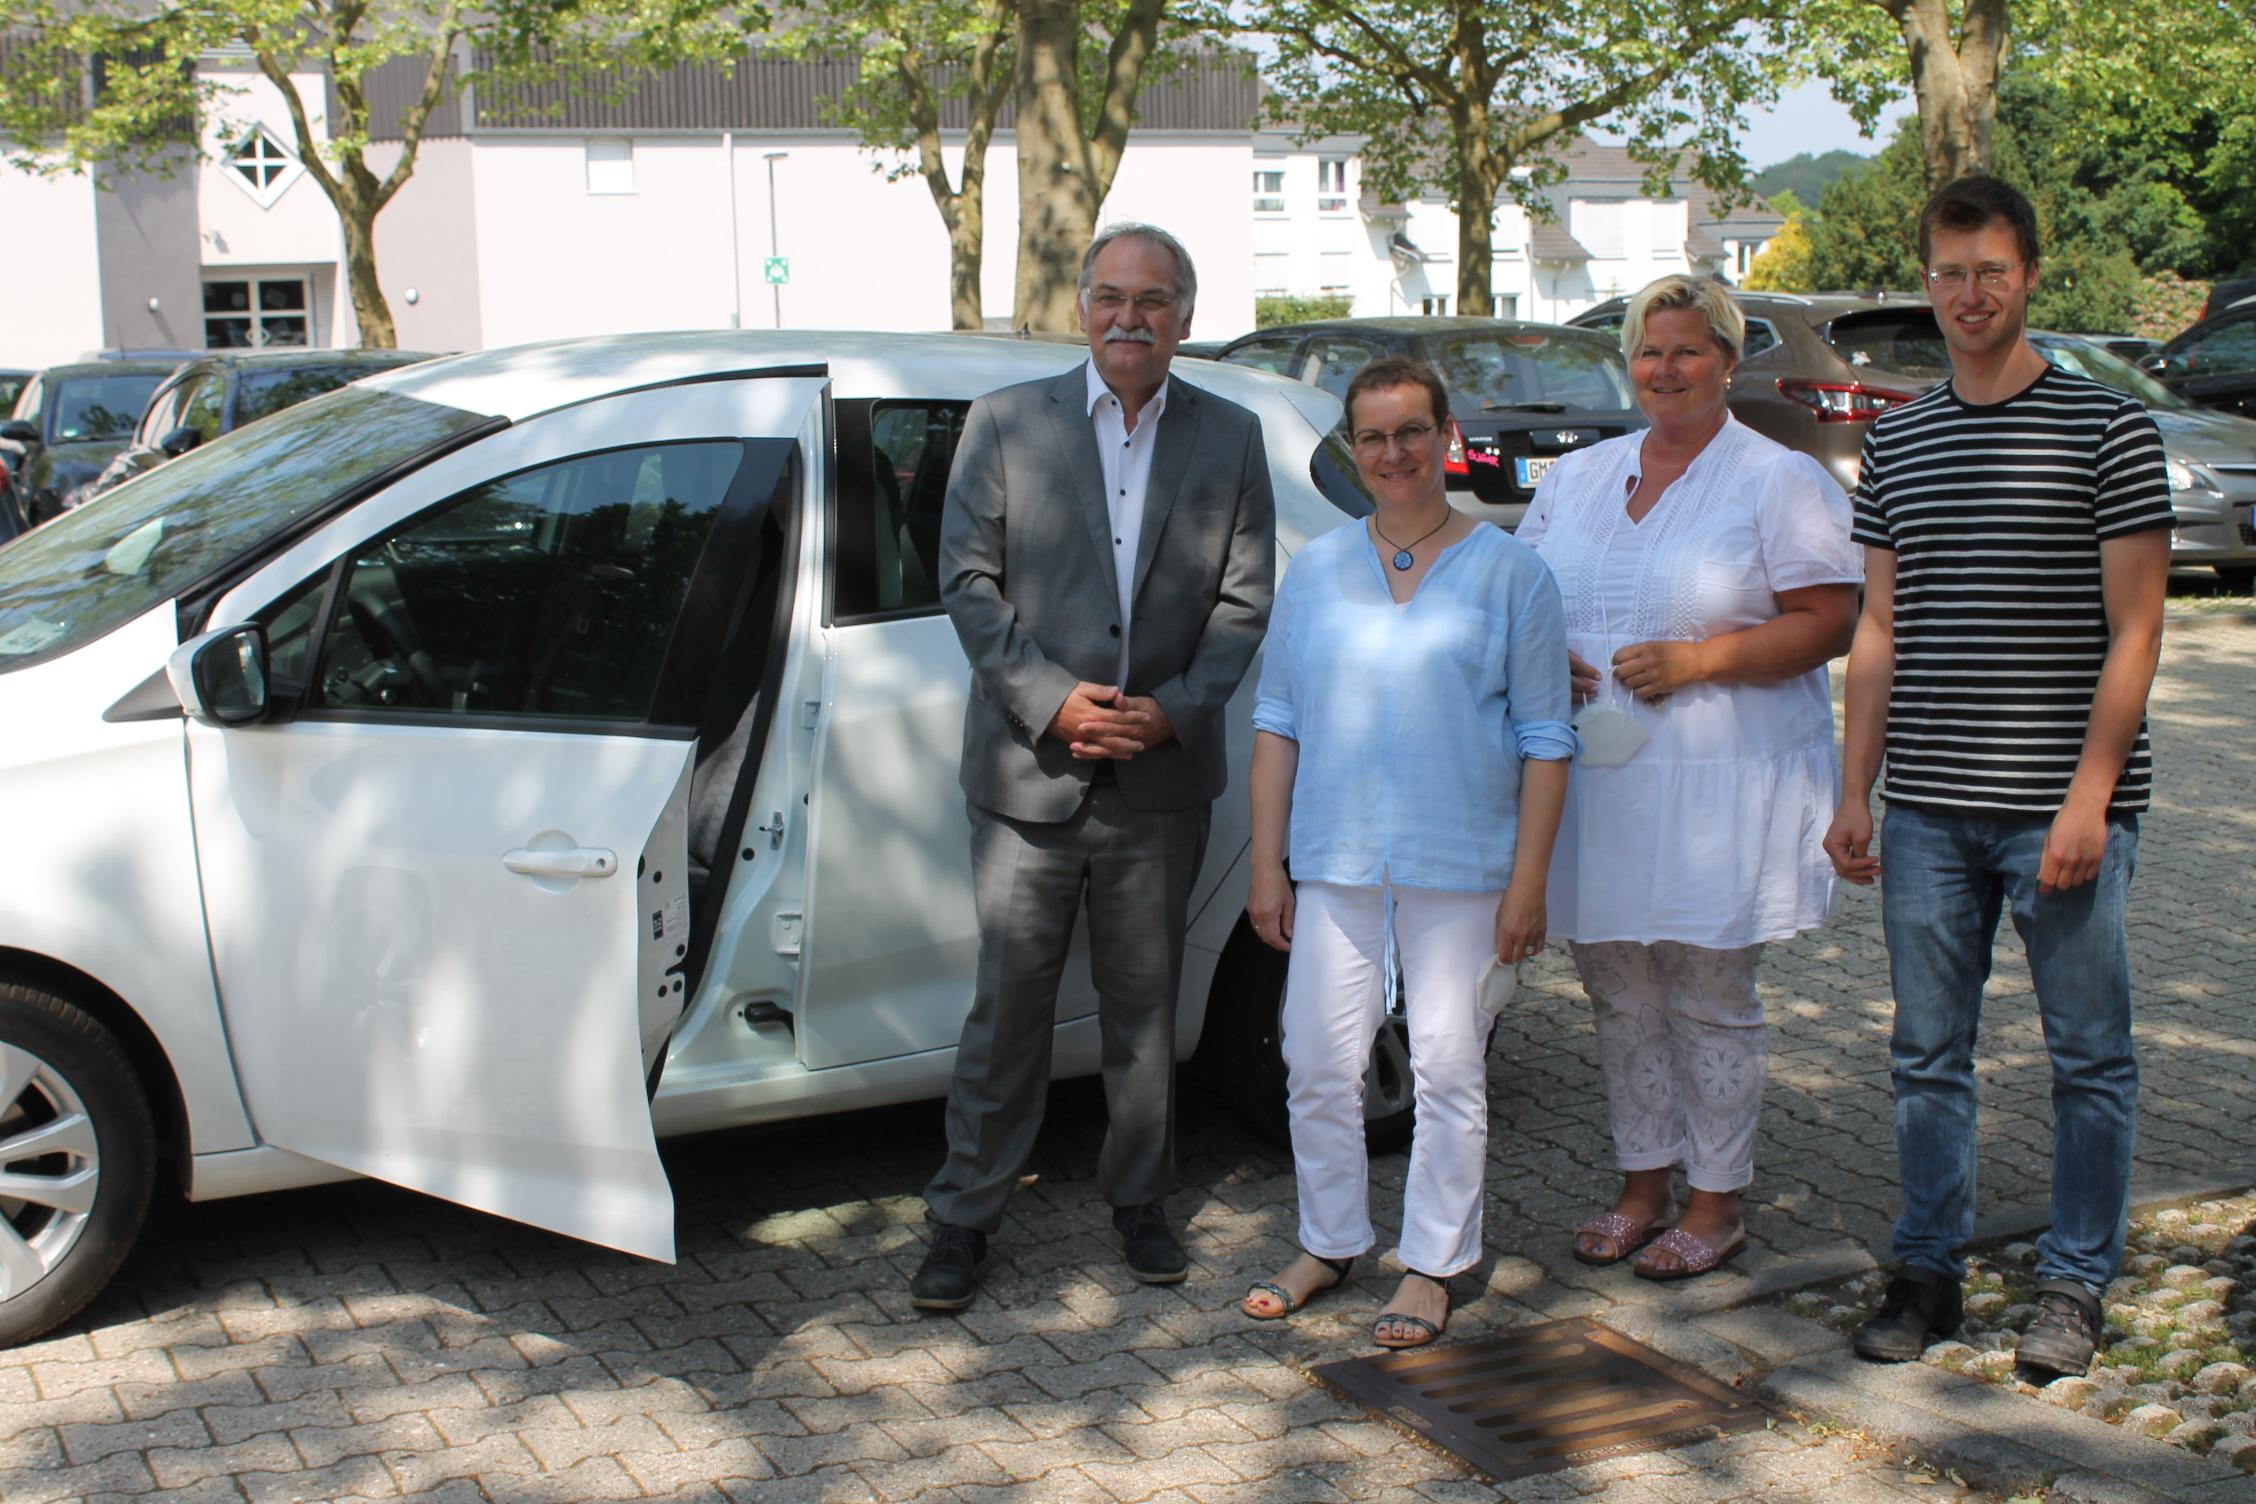 Start-Carsharing-15062021--6--v-l--Johannes-Mans-Sandra-Hilverkus-Anja-Gruchmann-und-Niklas-Lajewski--002-.JPG